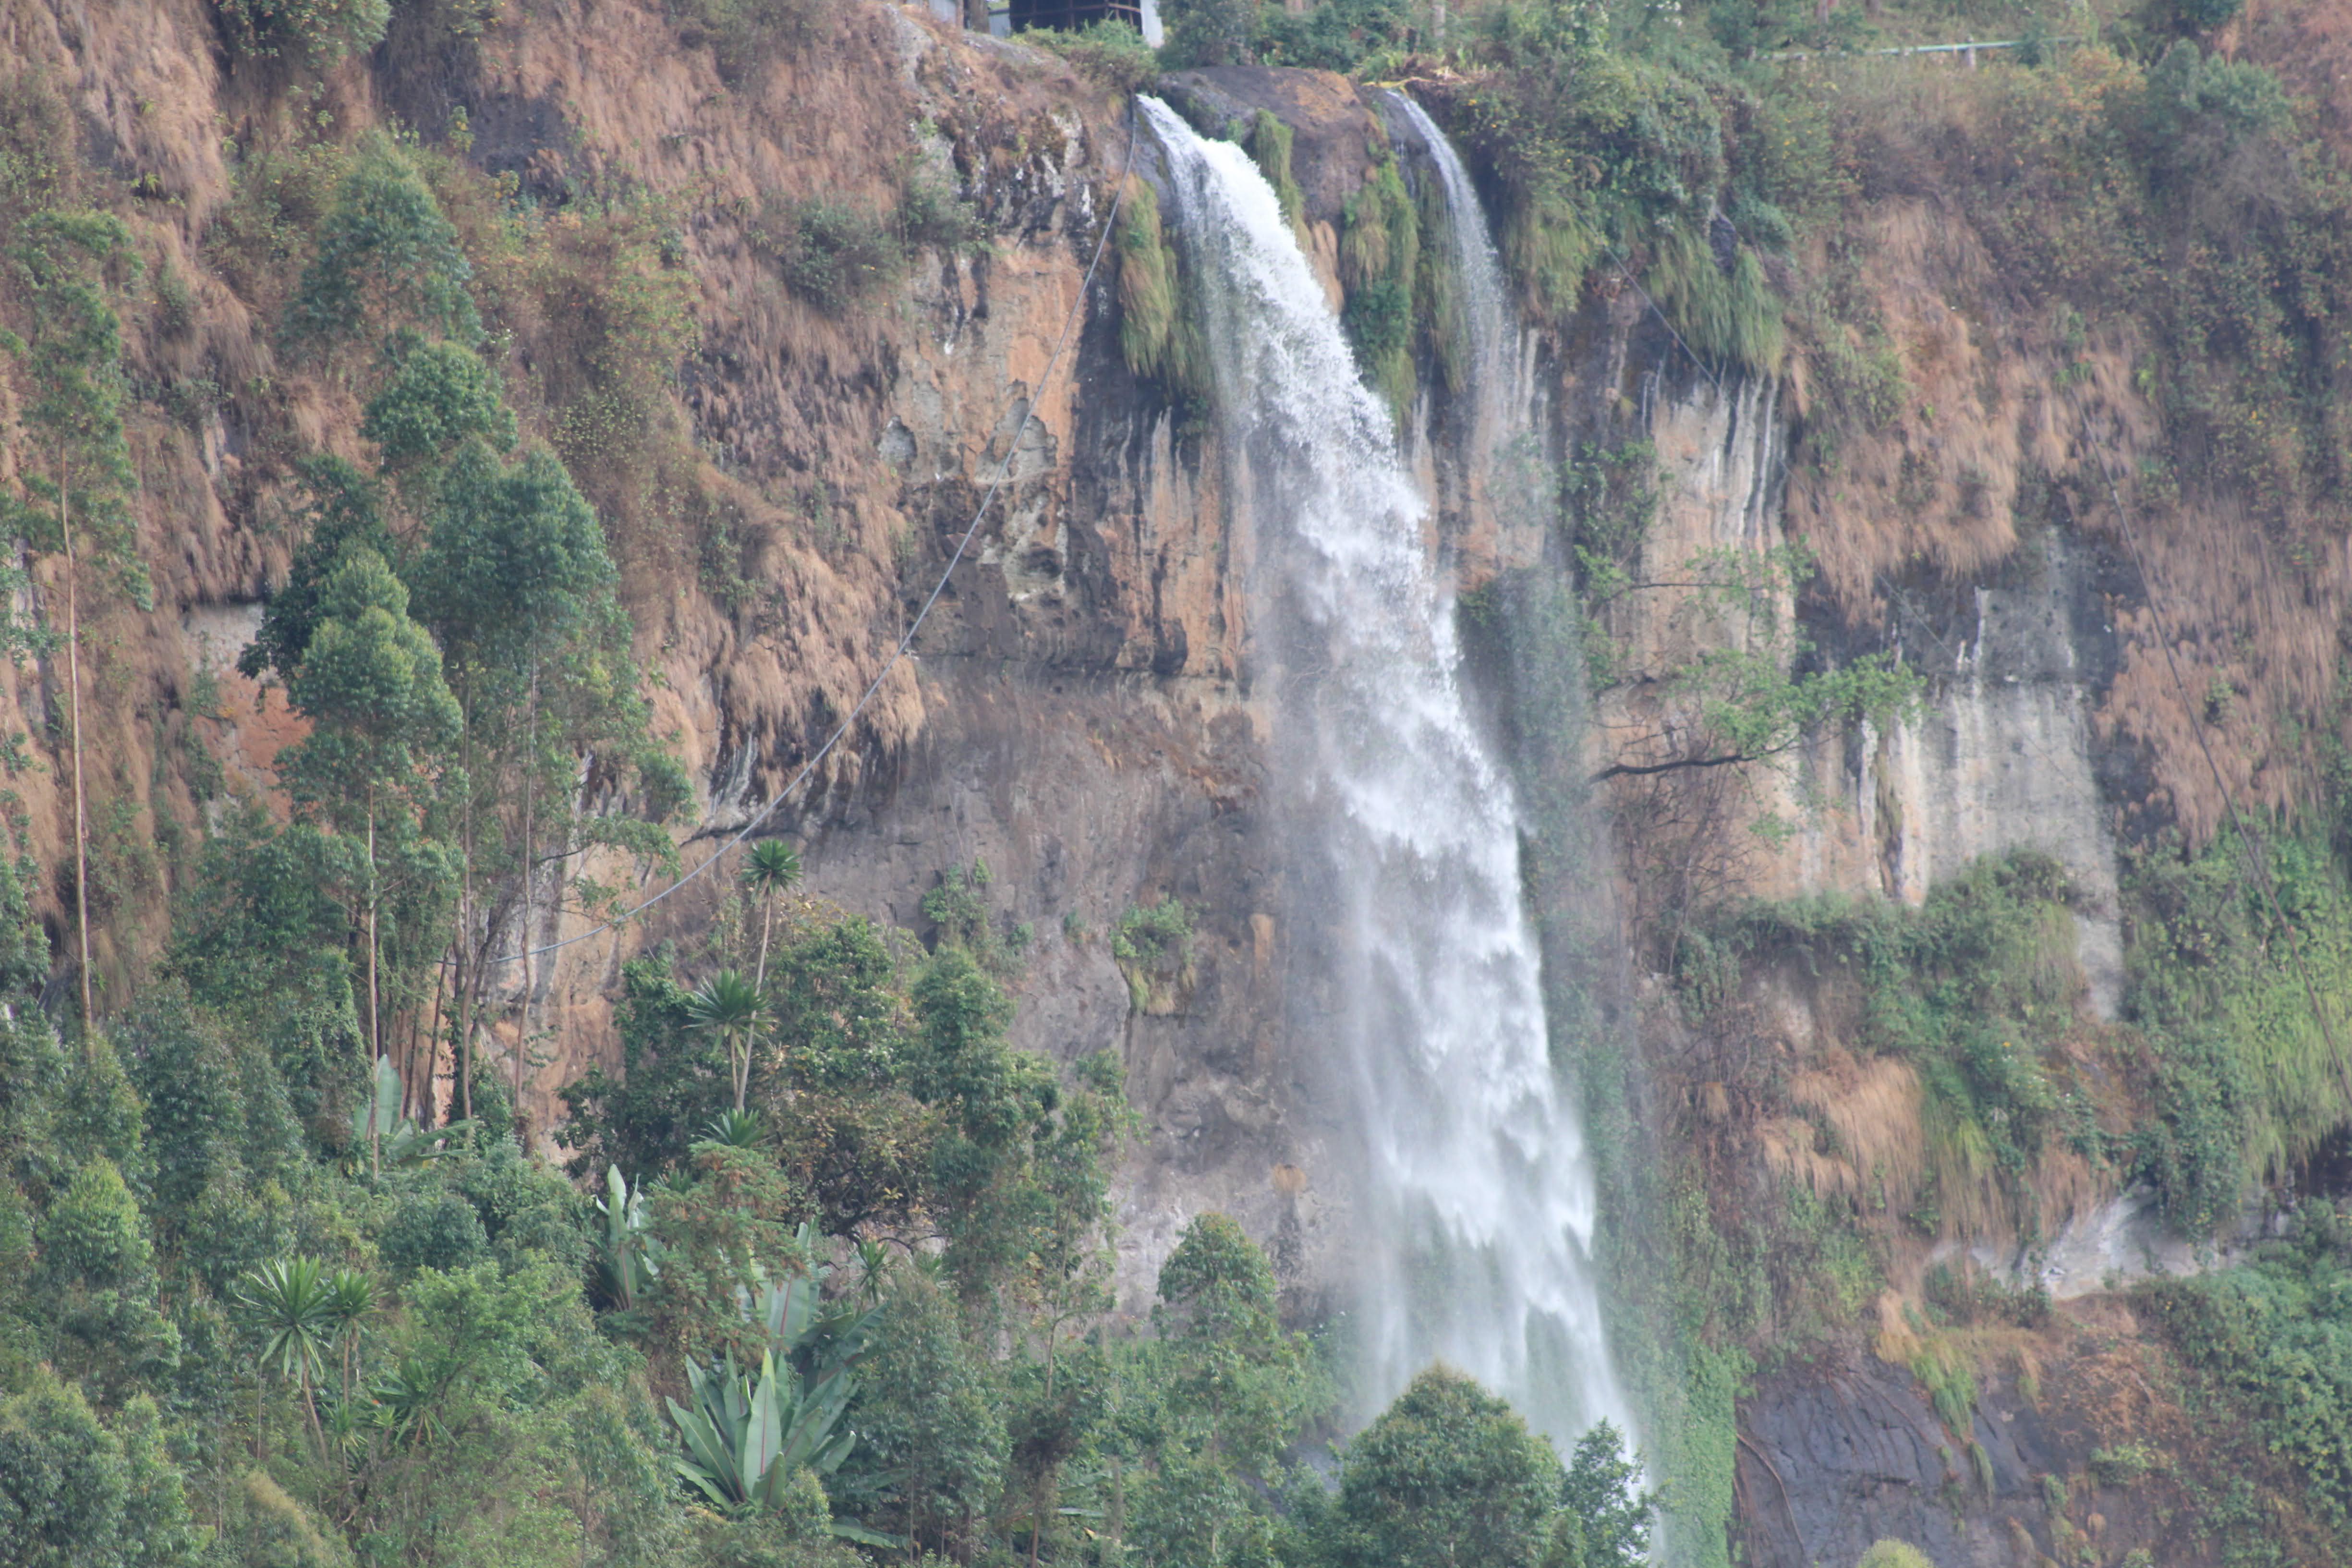 3 Days Eastern Uganda, Sipi falls Tour and Jinja adventure, Hiking, Abseiling, Jinja adventure, Source of the Nile visit